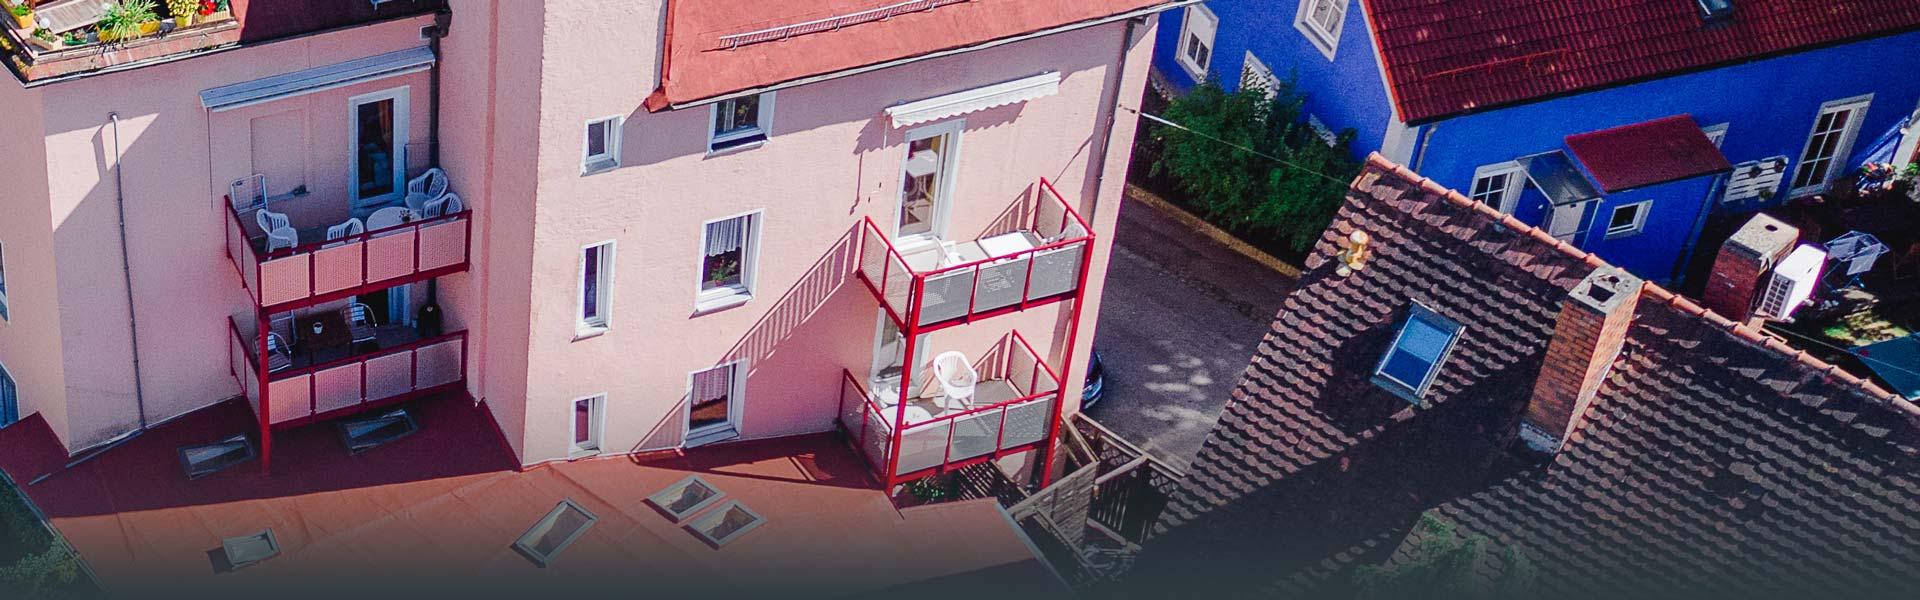 Stadtapartment-mit-Balkon-AugsburgLiving